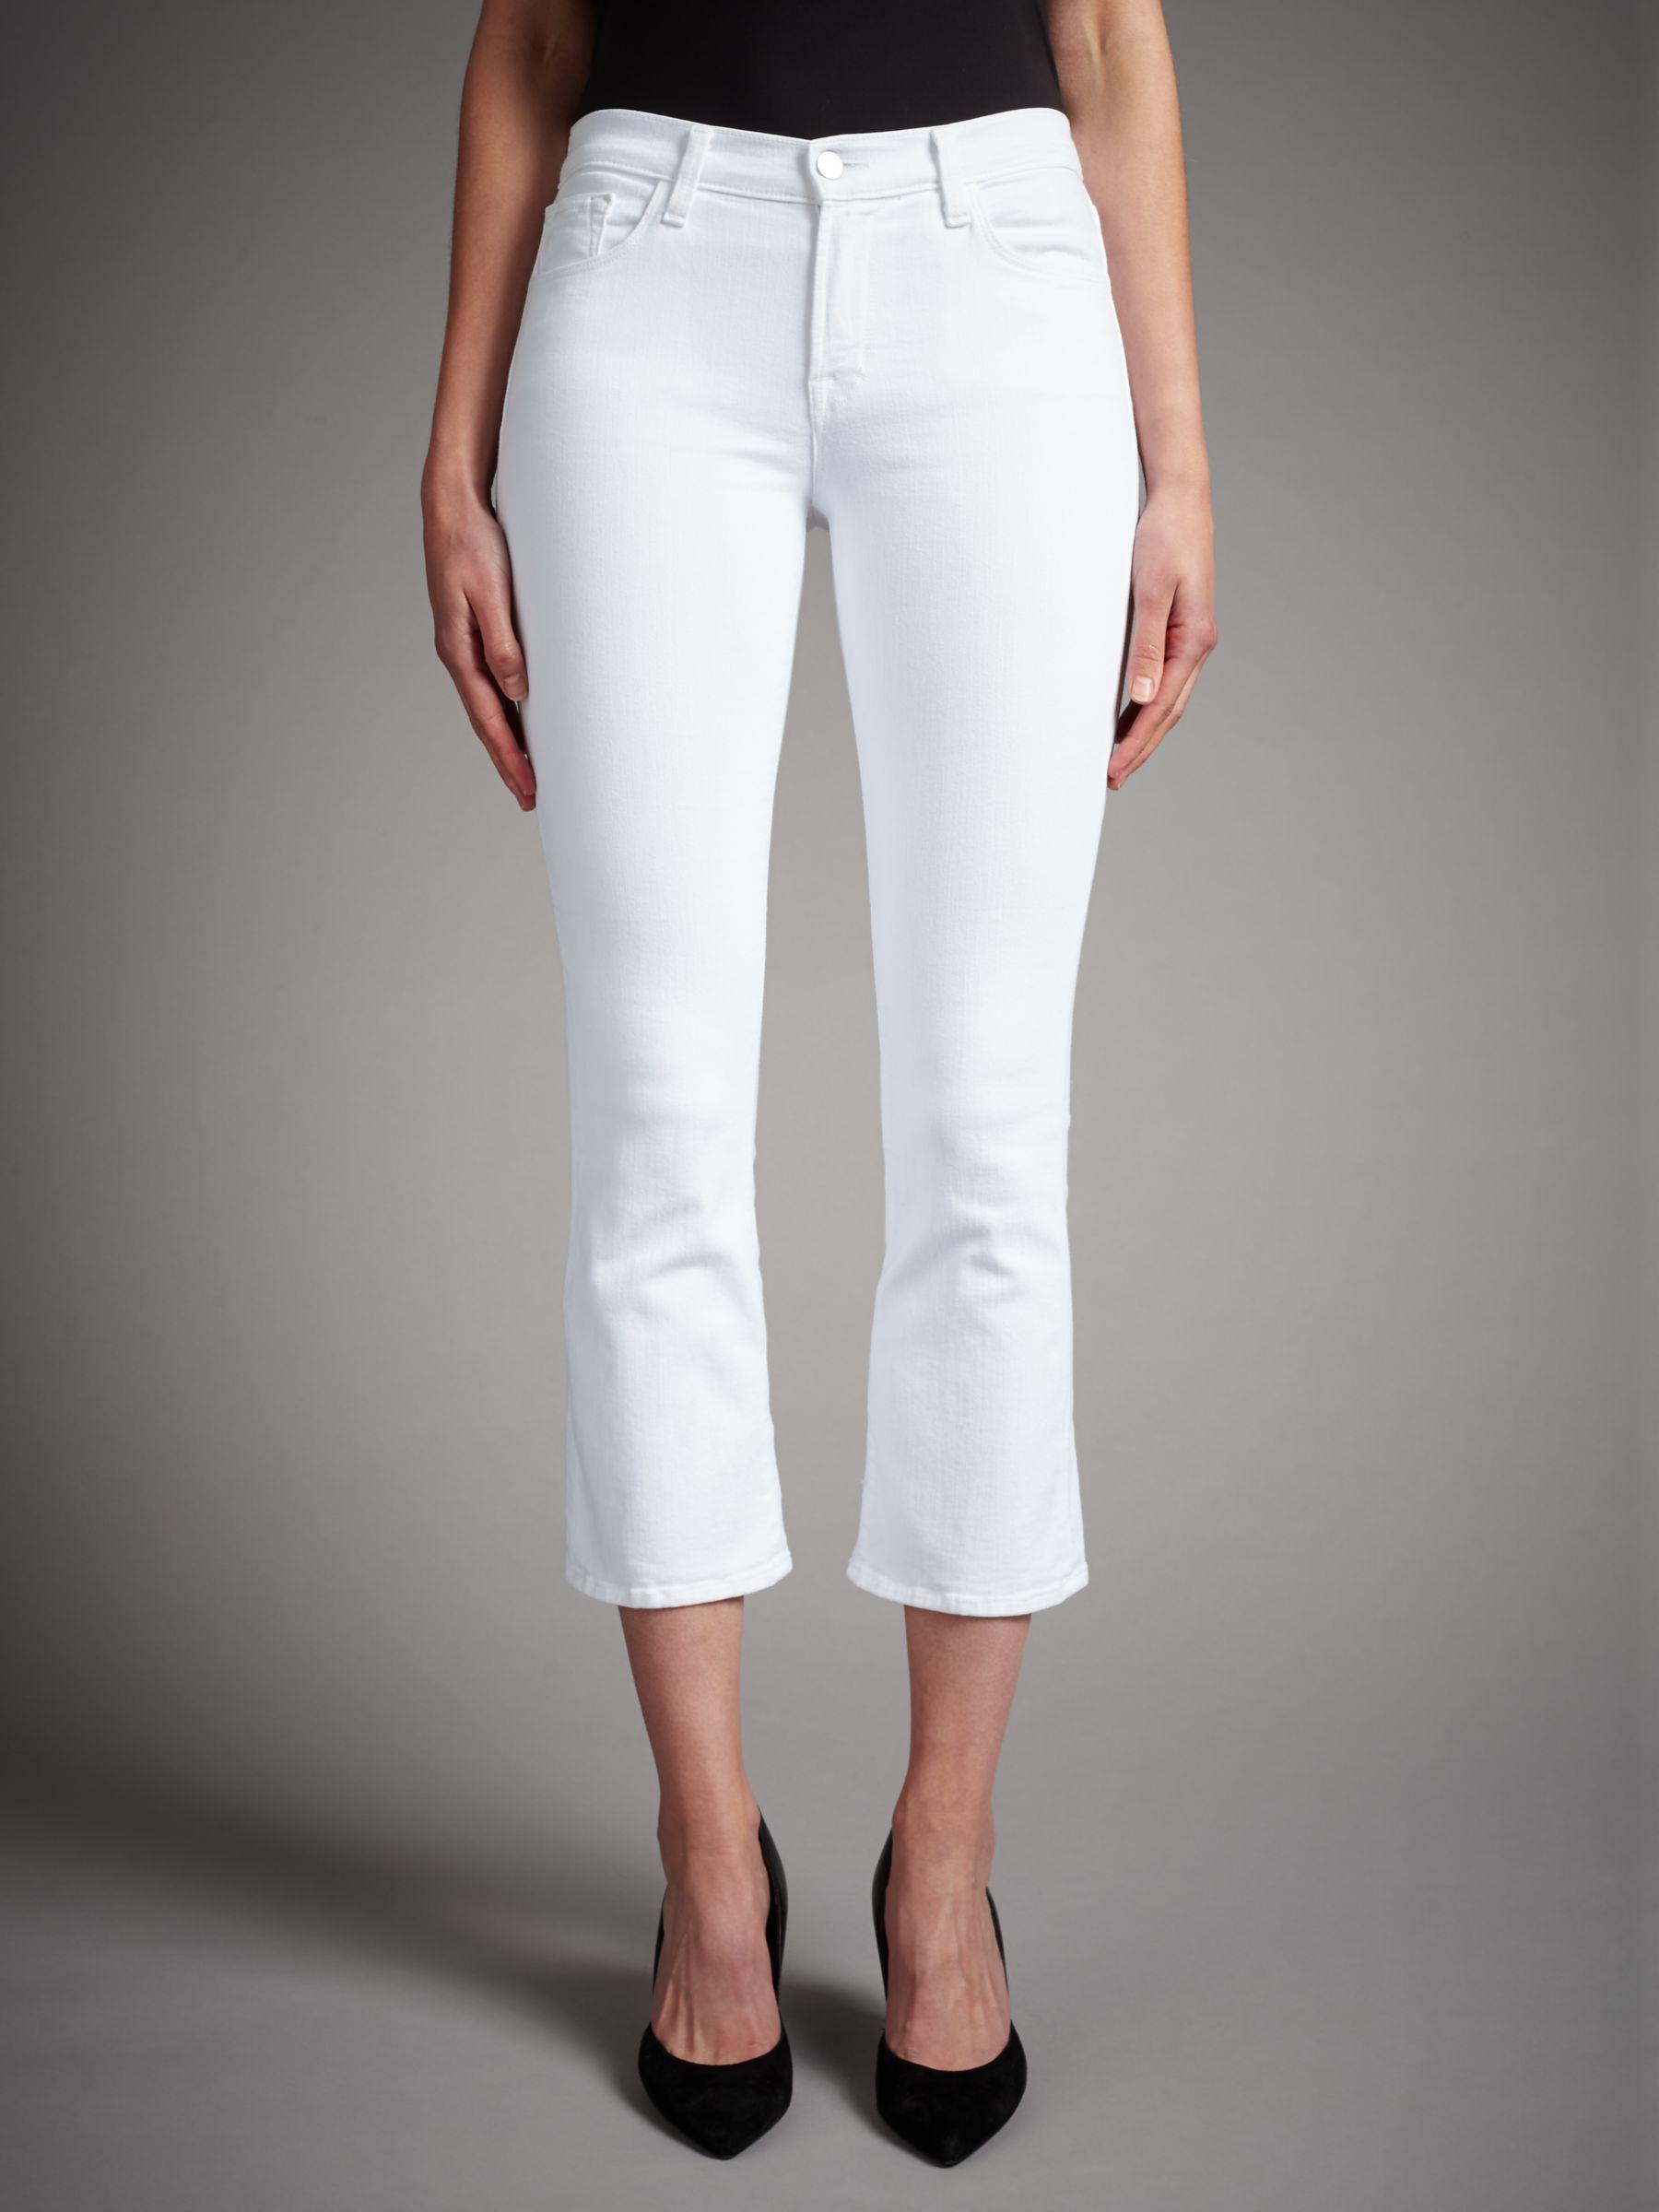 J Brand J Brand Selena Mid Rise Cropped Bootcut Jeans, Blanc